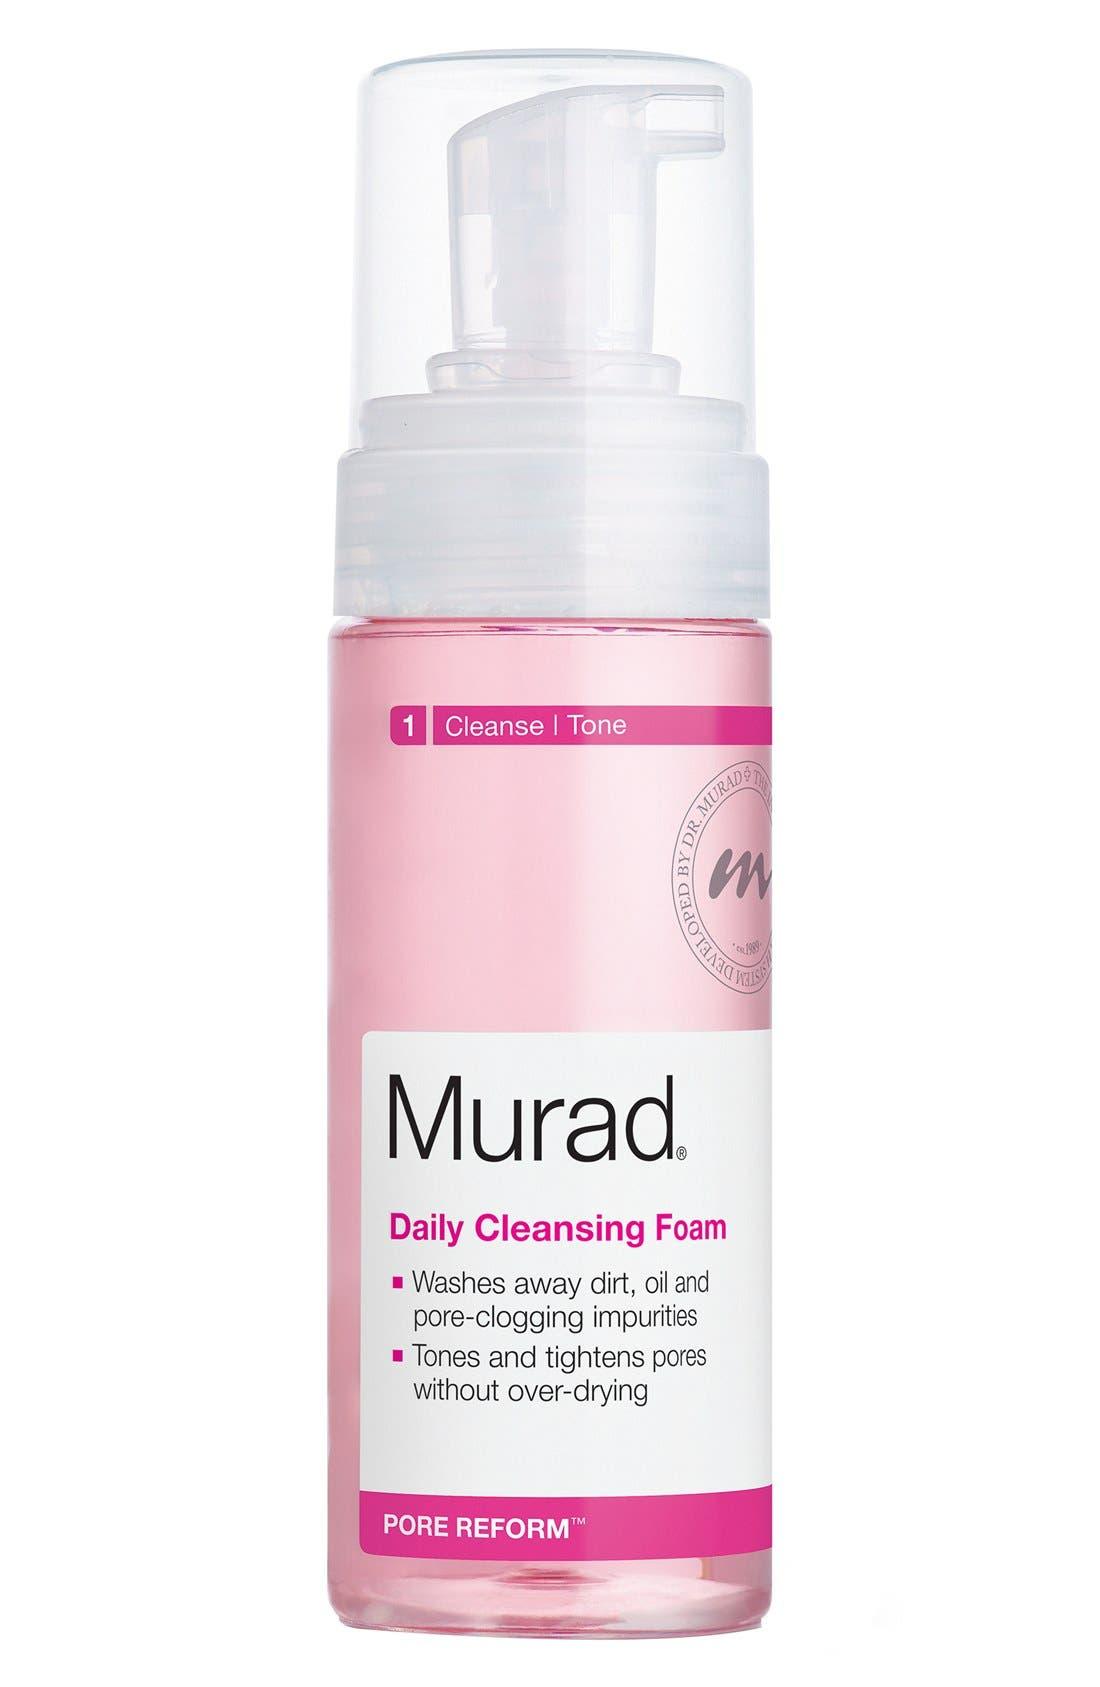 Murad® Daily Cleansing Foam